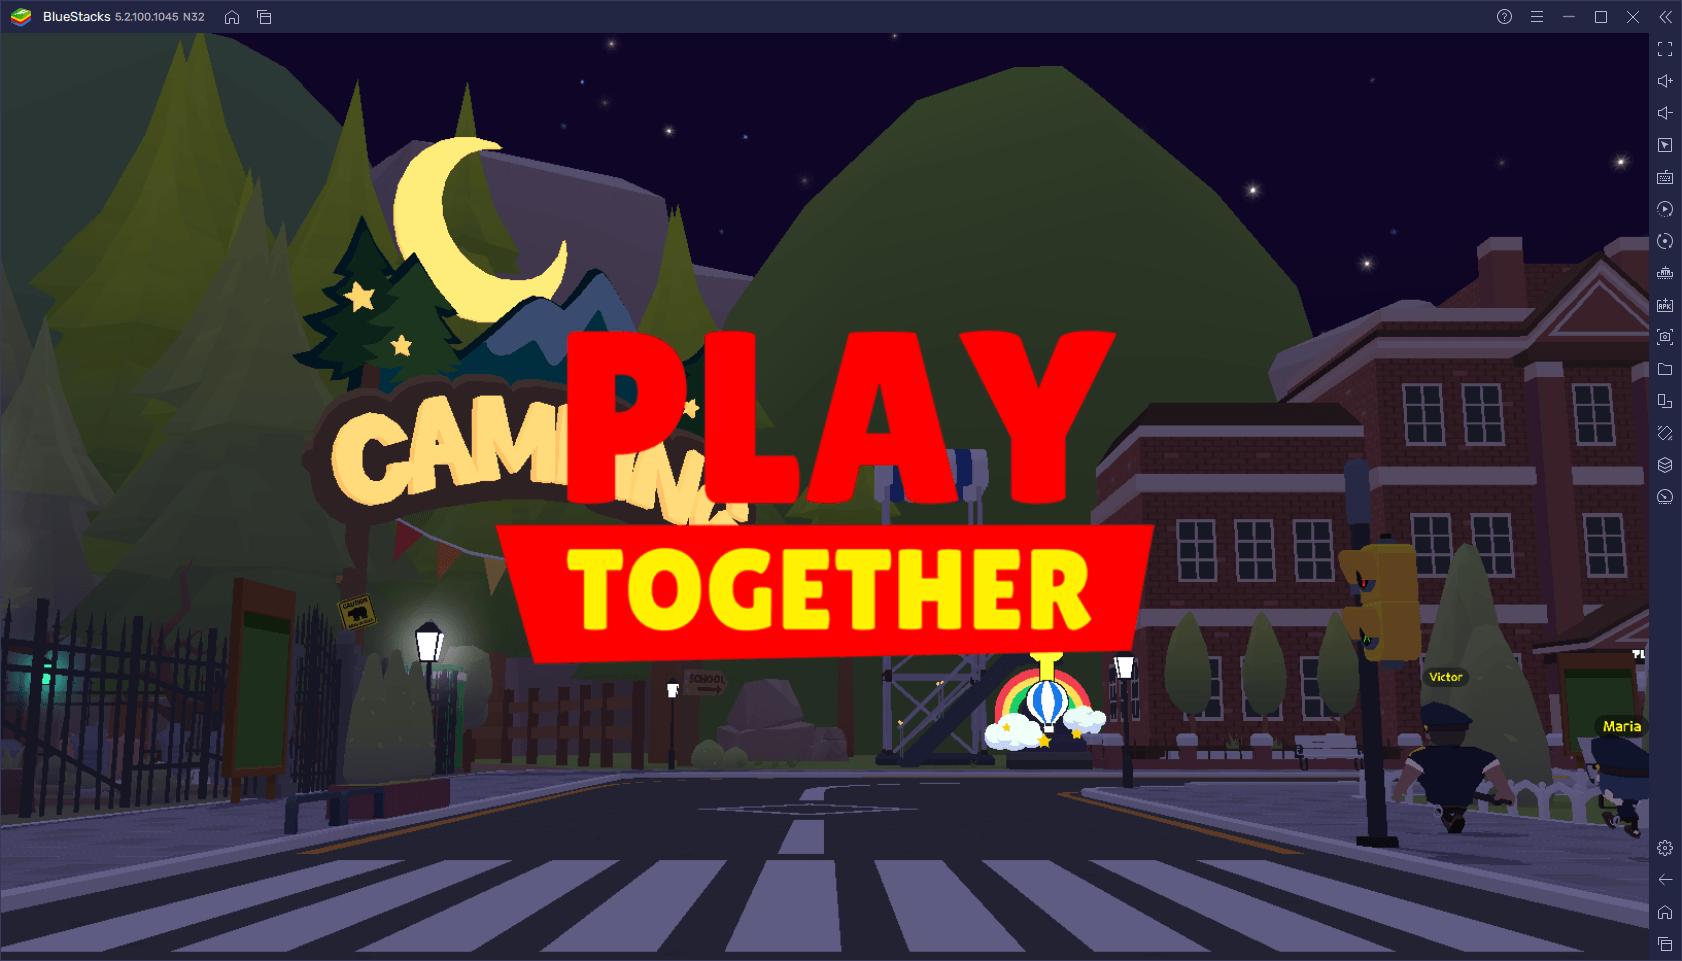 Comment Installer Play Together sur PC avec BlueStacks